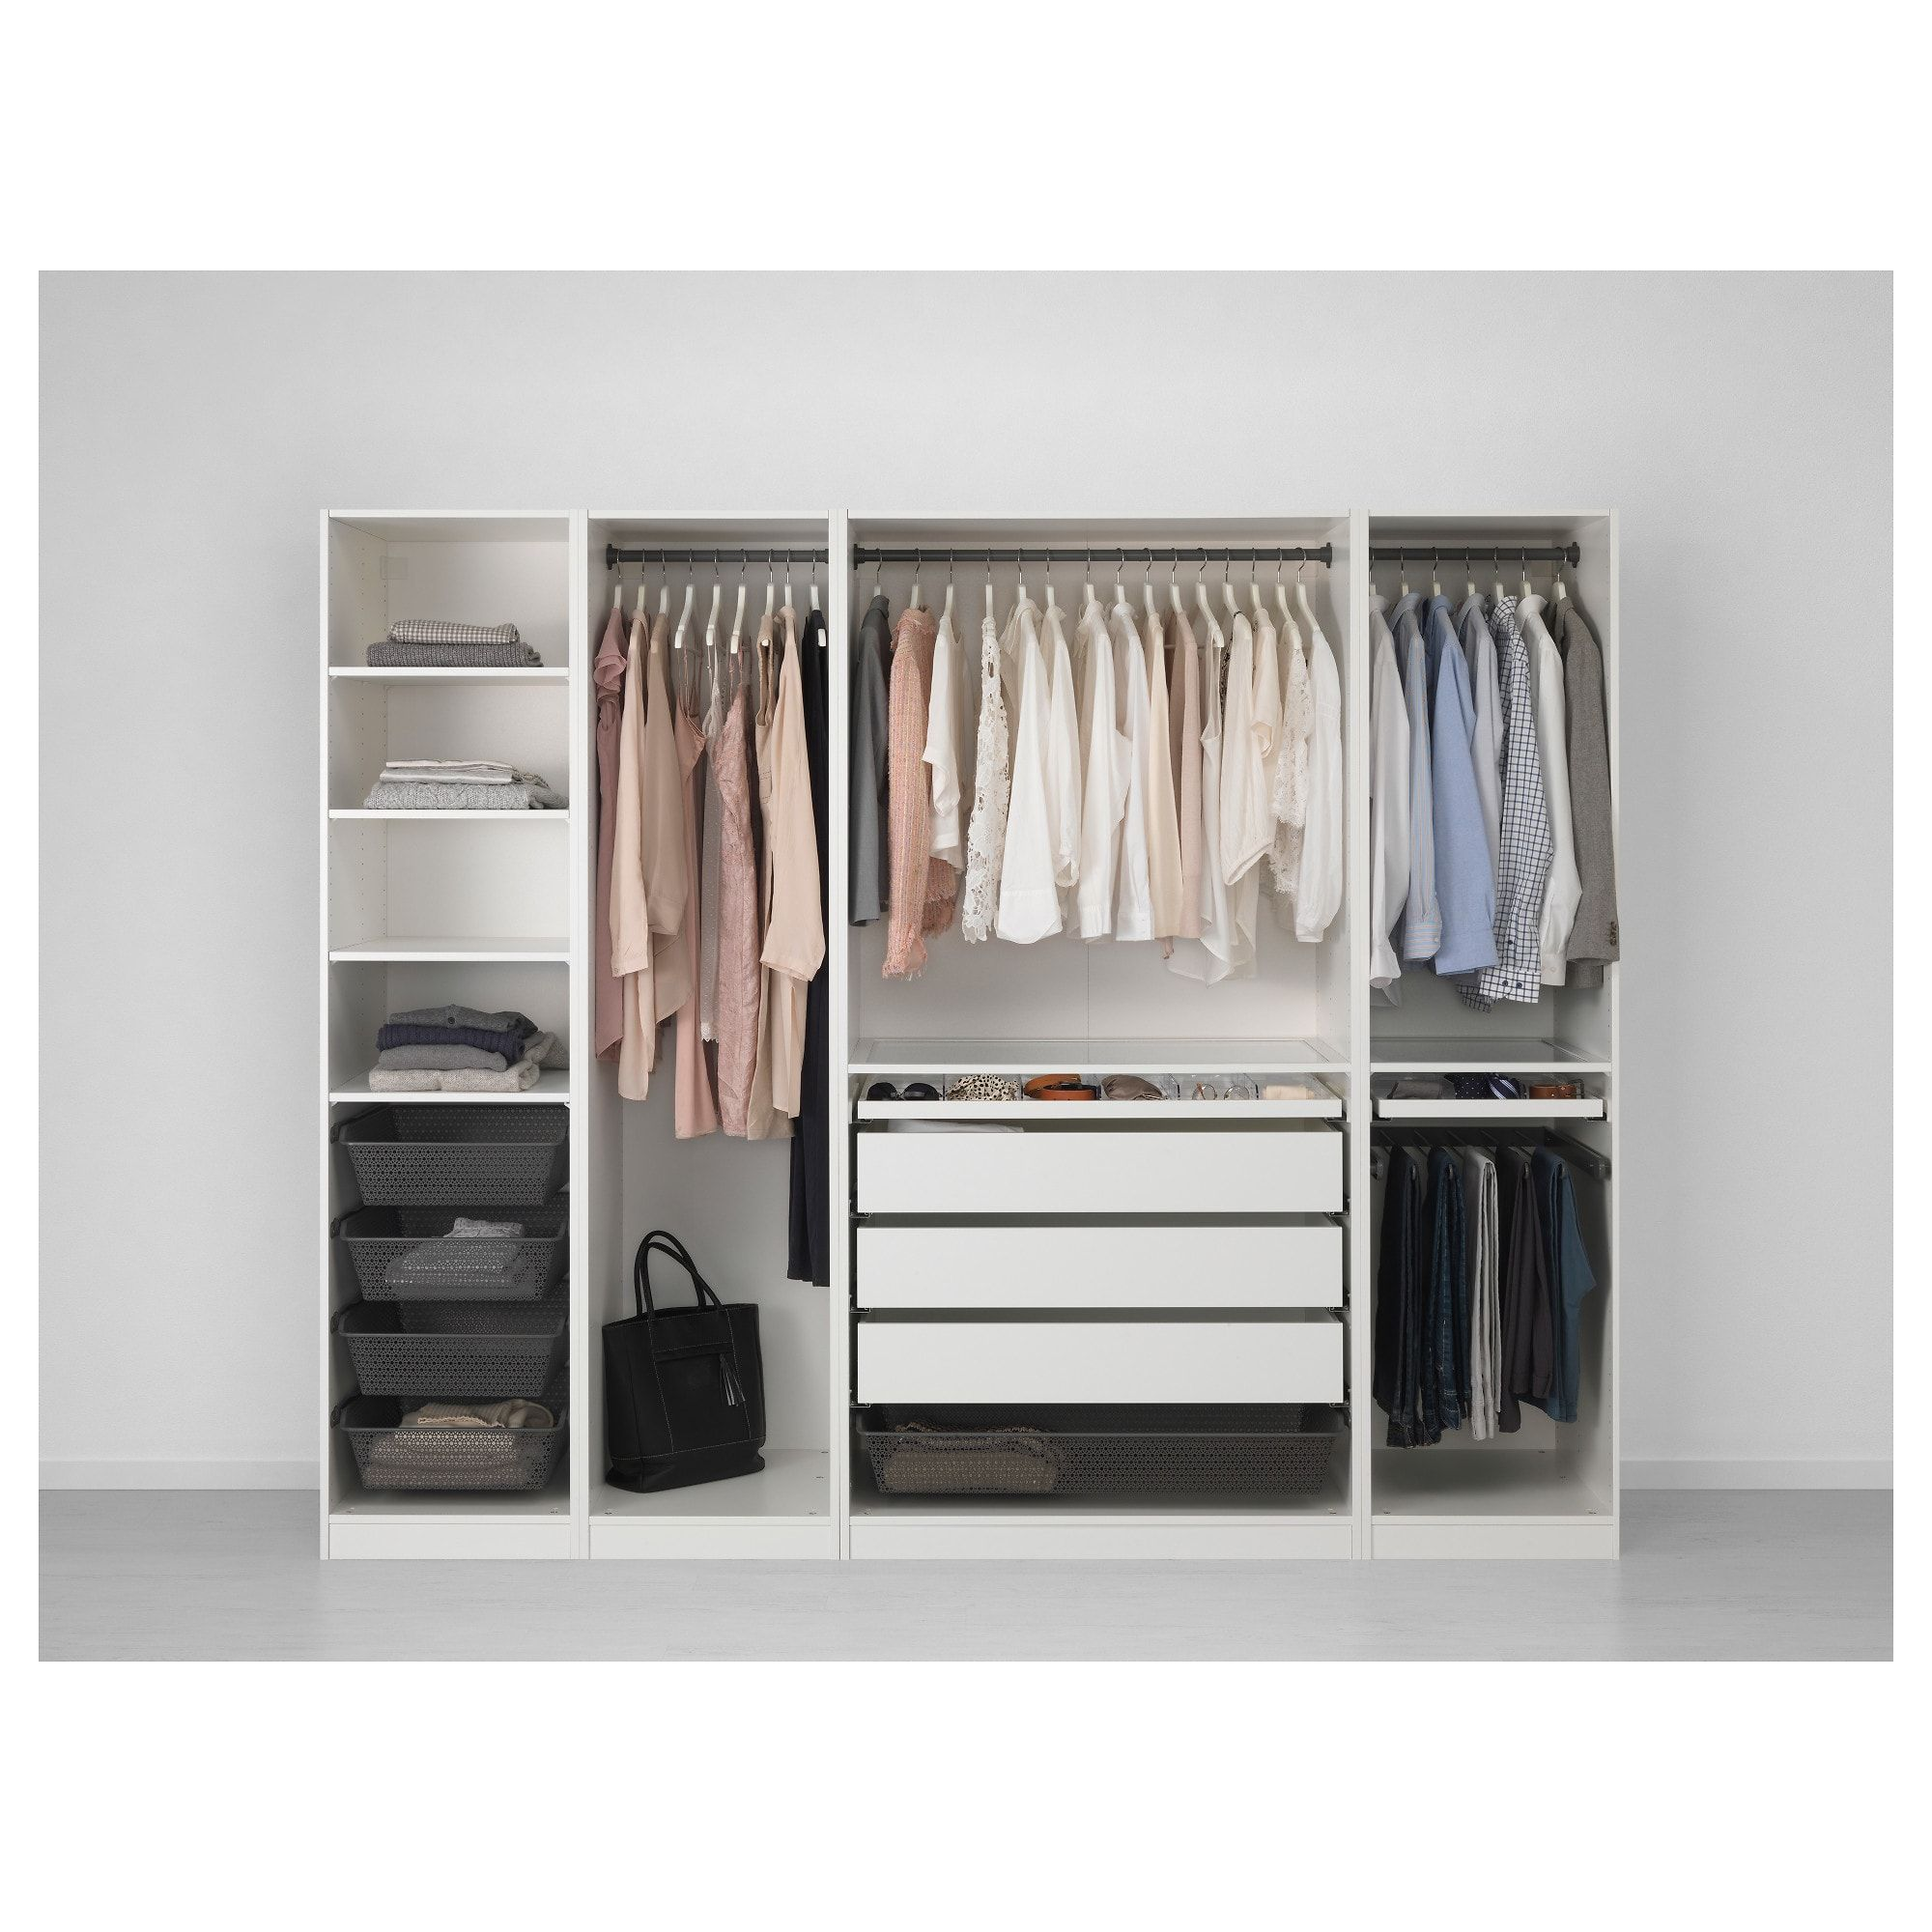 Us Furniture And Home Furnishings Dizajn Gardrob Es Szekreny